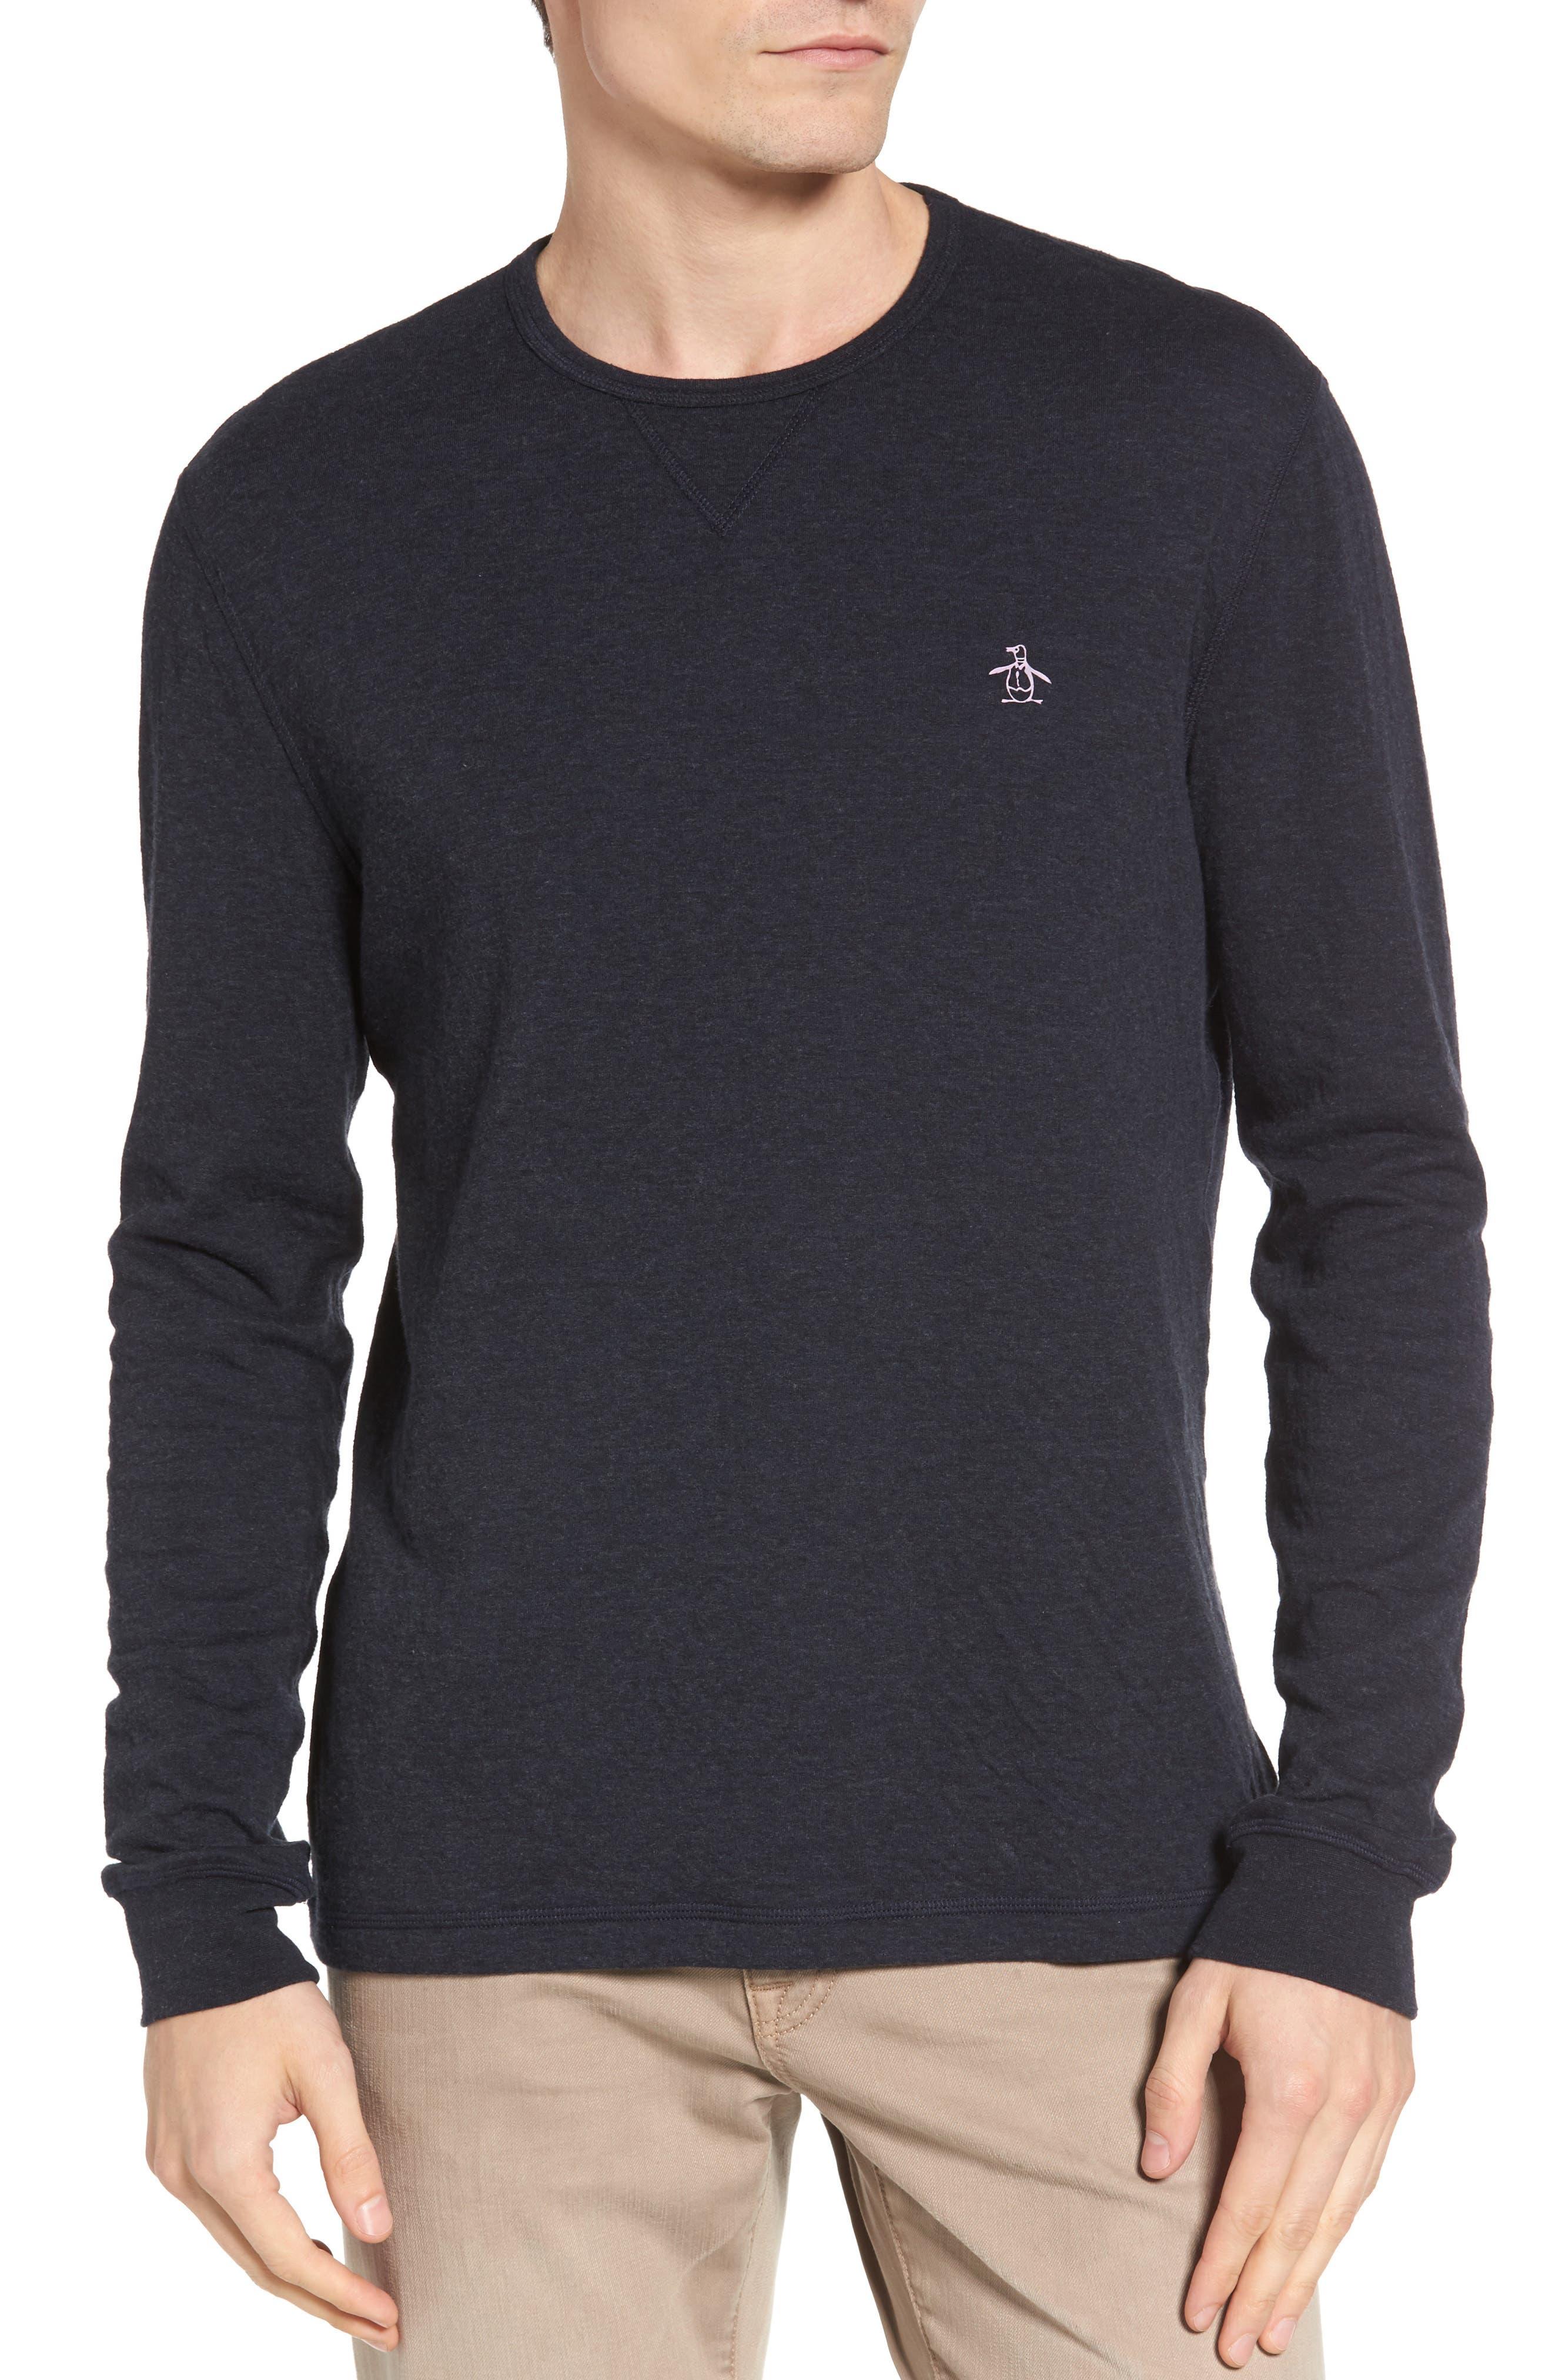 Image of Original Penguin Reversible Long Sleeve T-Shirt